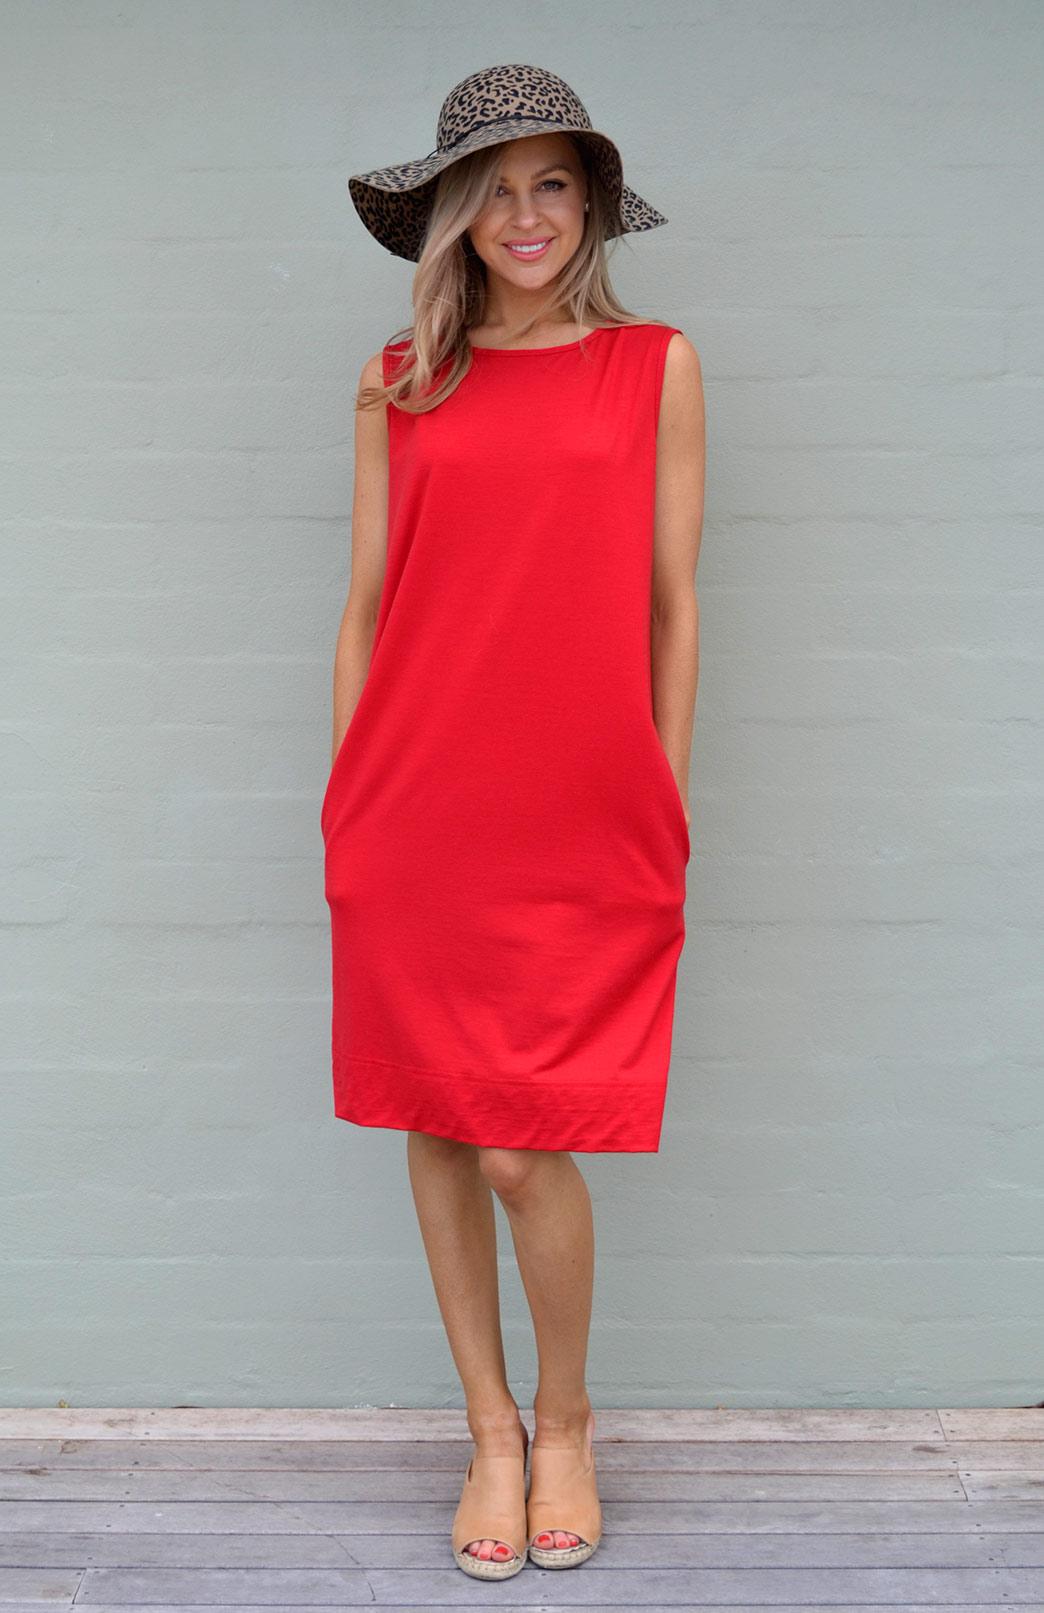 Holly Dress - Women's Flame Red Merino Wool Sleeveless Shift Dress with Pockets - Smitten Merino Tasmania Australia